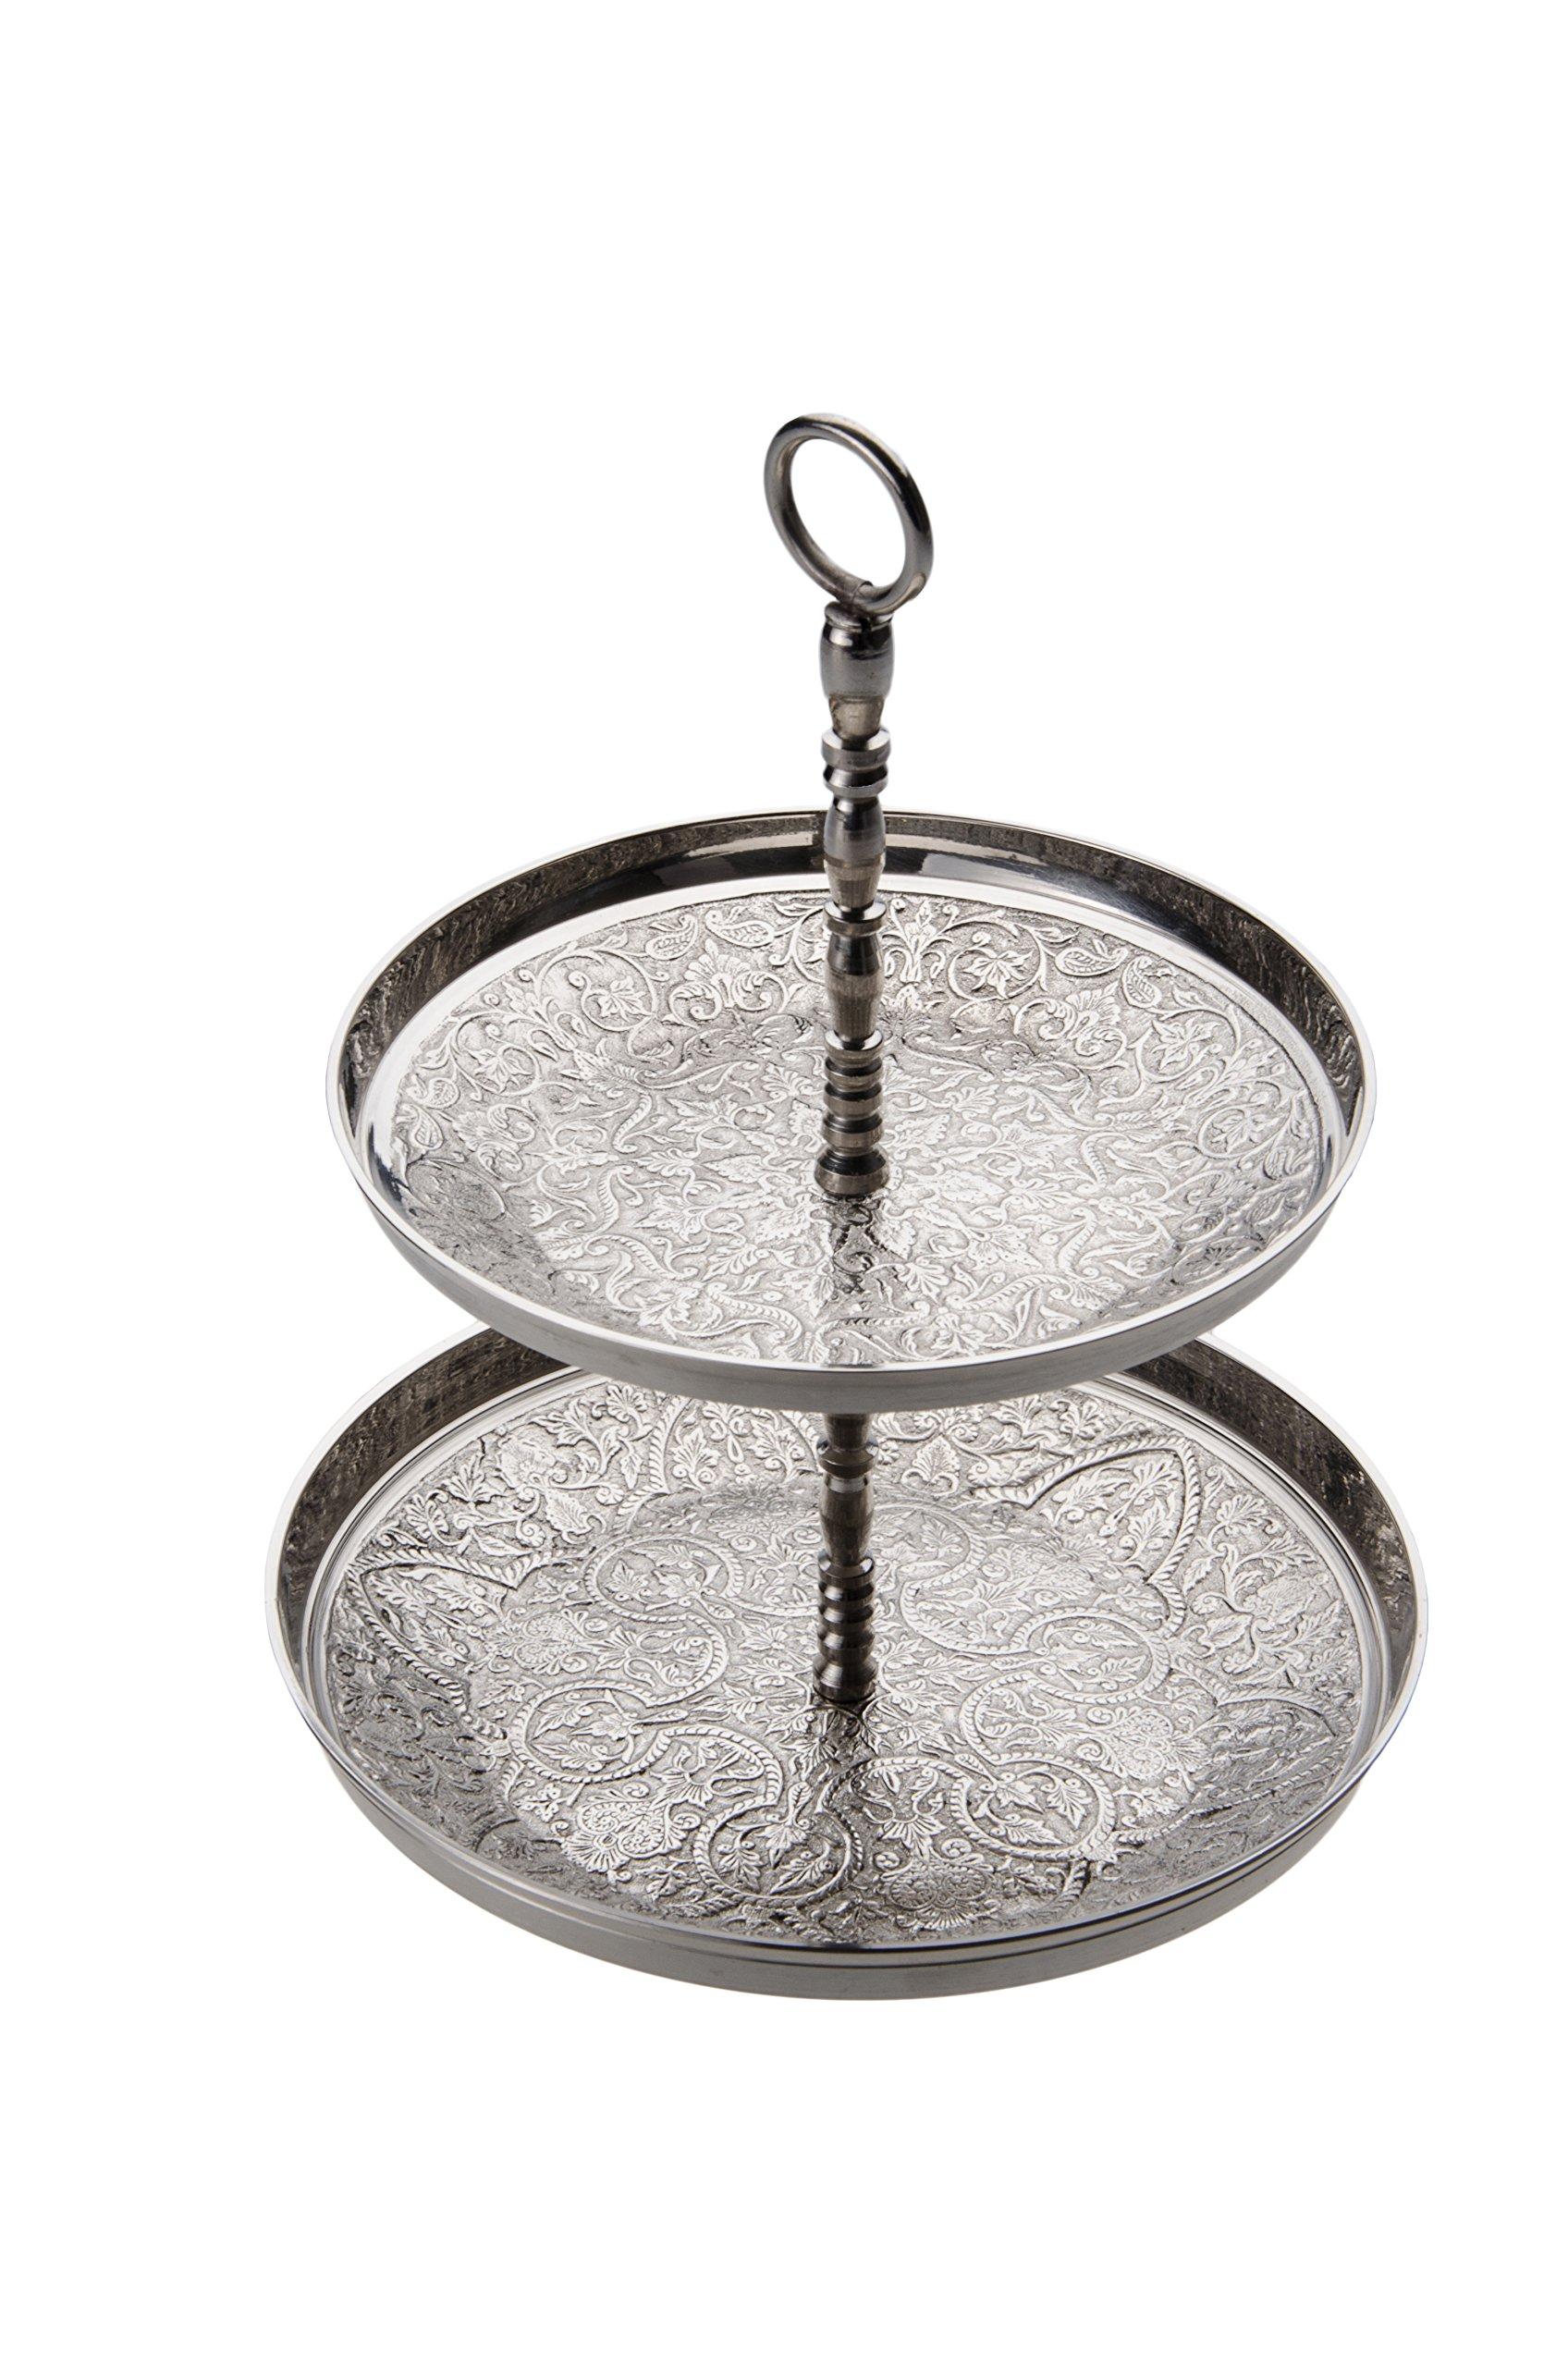 Marrakesch Orient & Mediterran Interior  Oriental Etagere Moroccan Indian Brass Cake Stand Fruit Stand - Awatif - Silver Colored